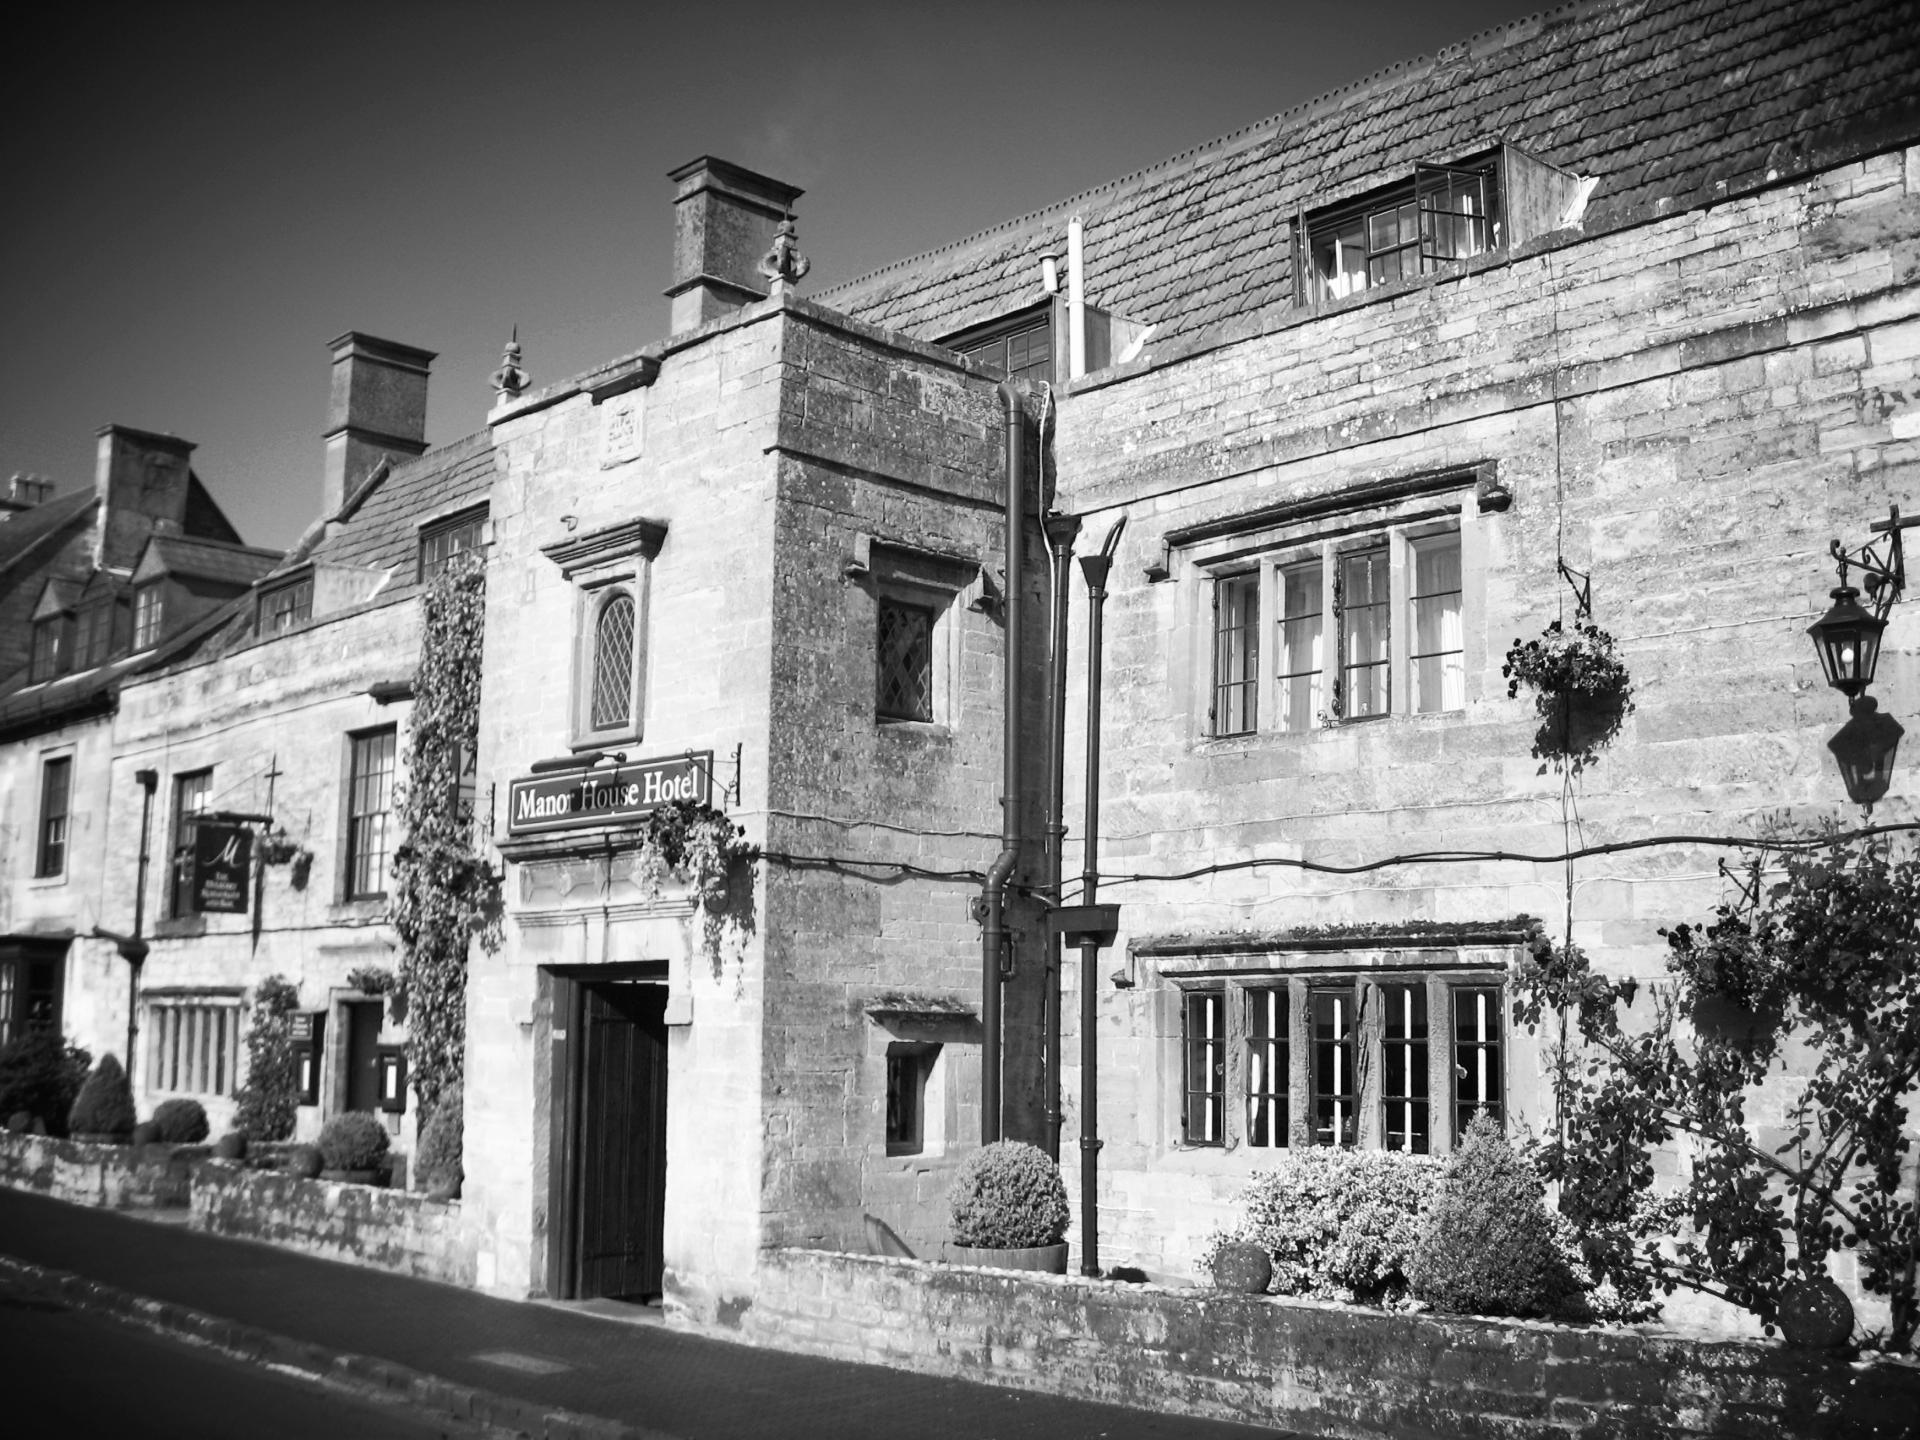 Manor House Hotel, Morton in Marsh